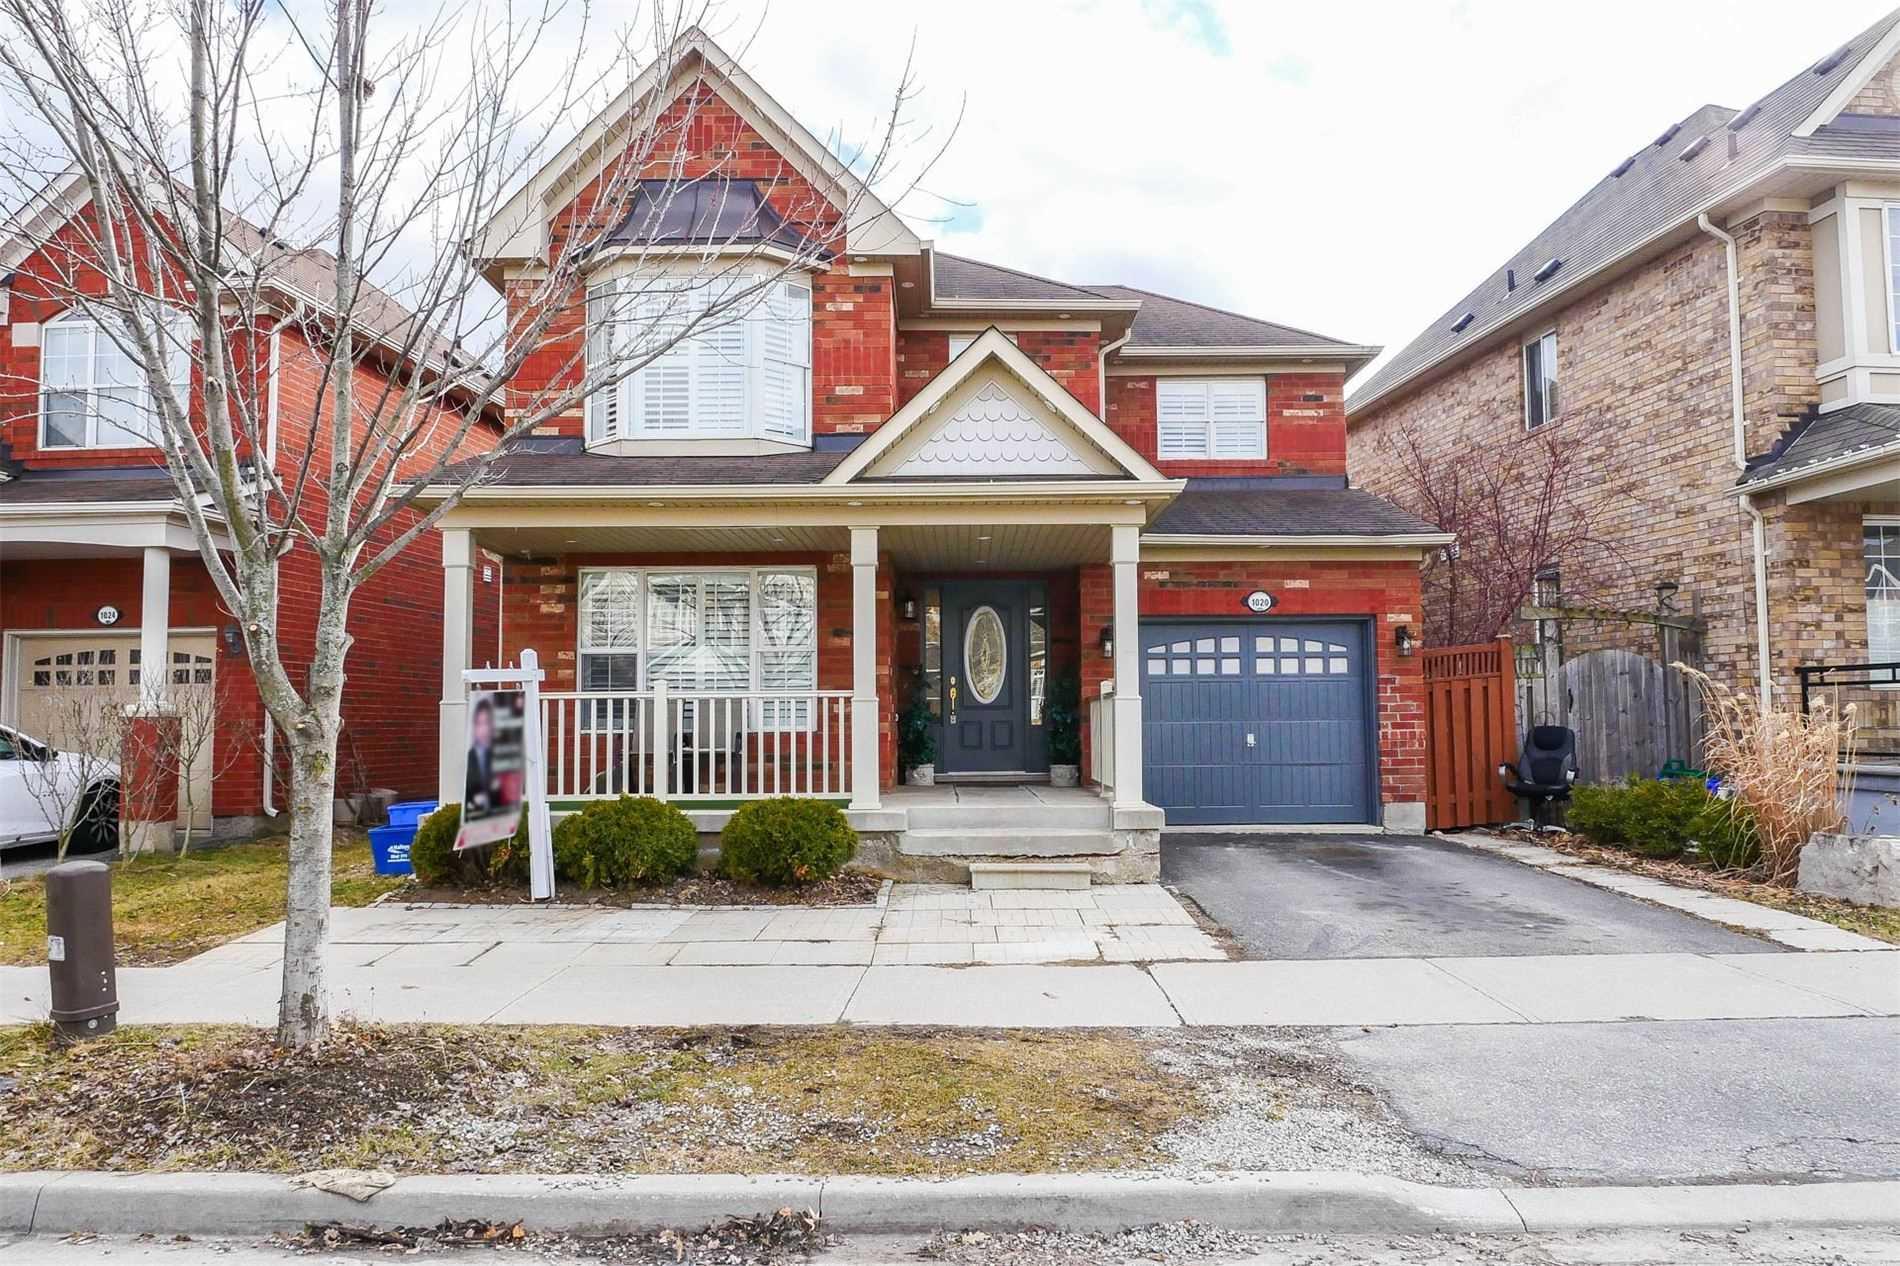 1020 Ferguson Dr, Milton, Ontario L9T6V5, 4 Bedrooms Bedrooms, 8 Rooms Rooms,4 BathroomsBathrooms,Detached,For Sale,Ferguson,W4760912